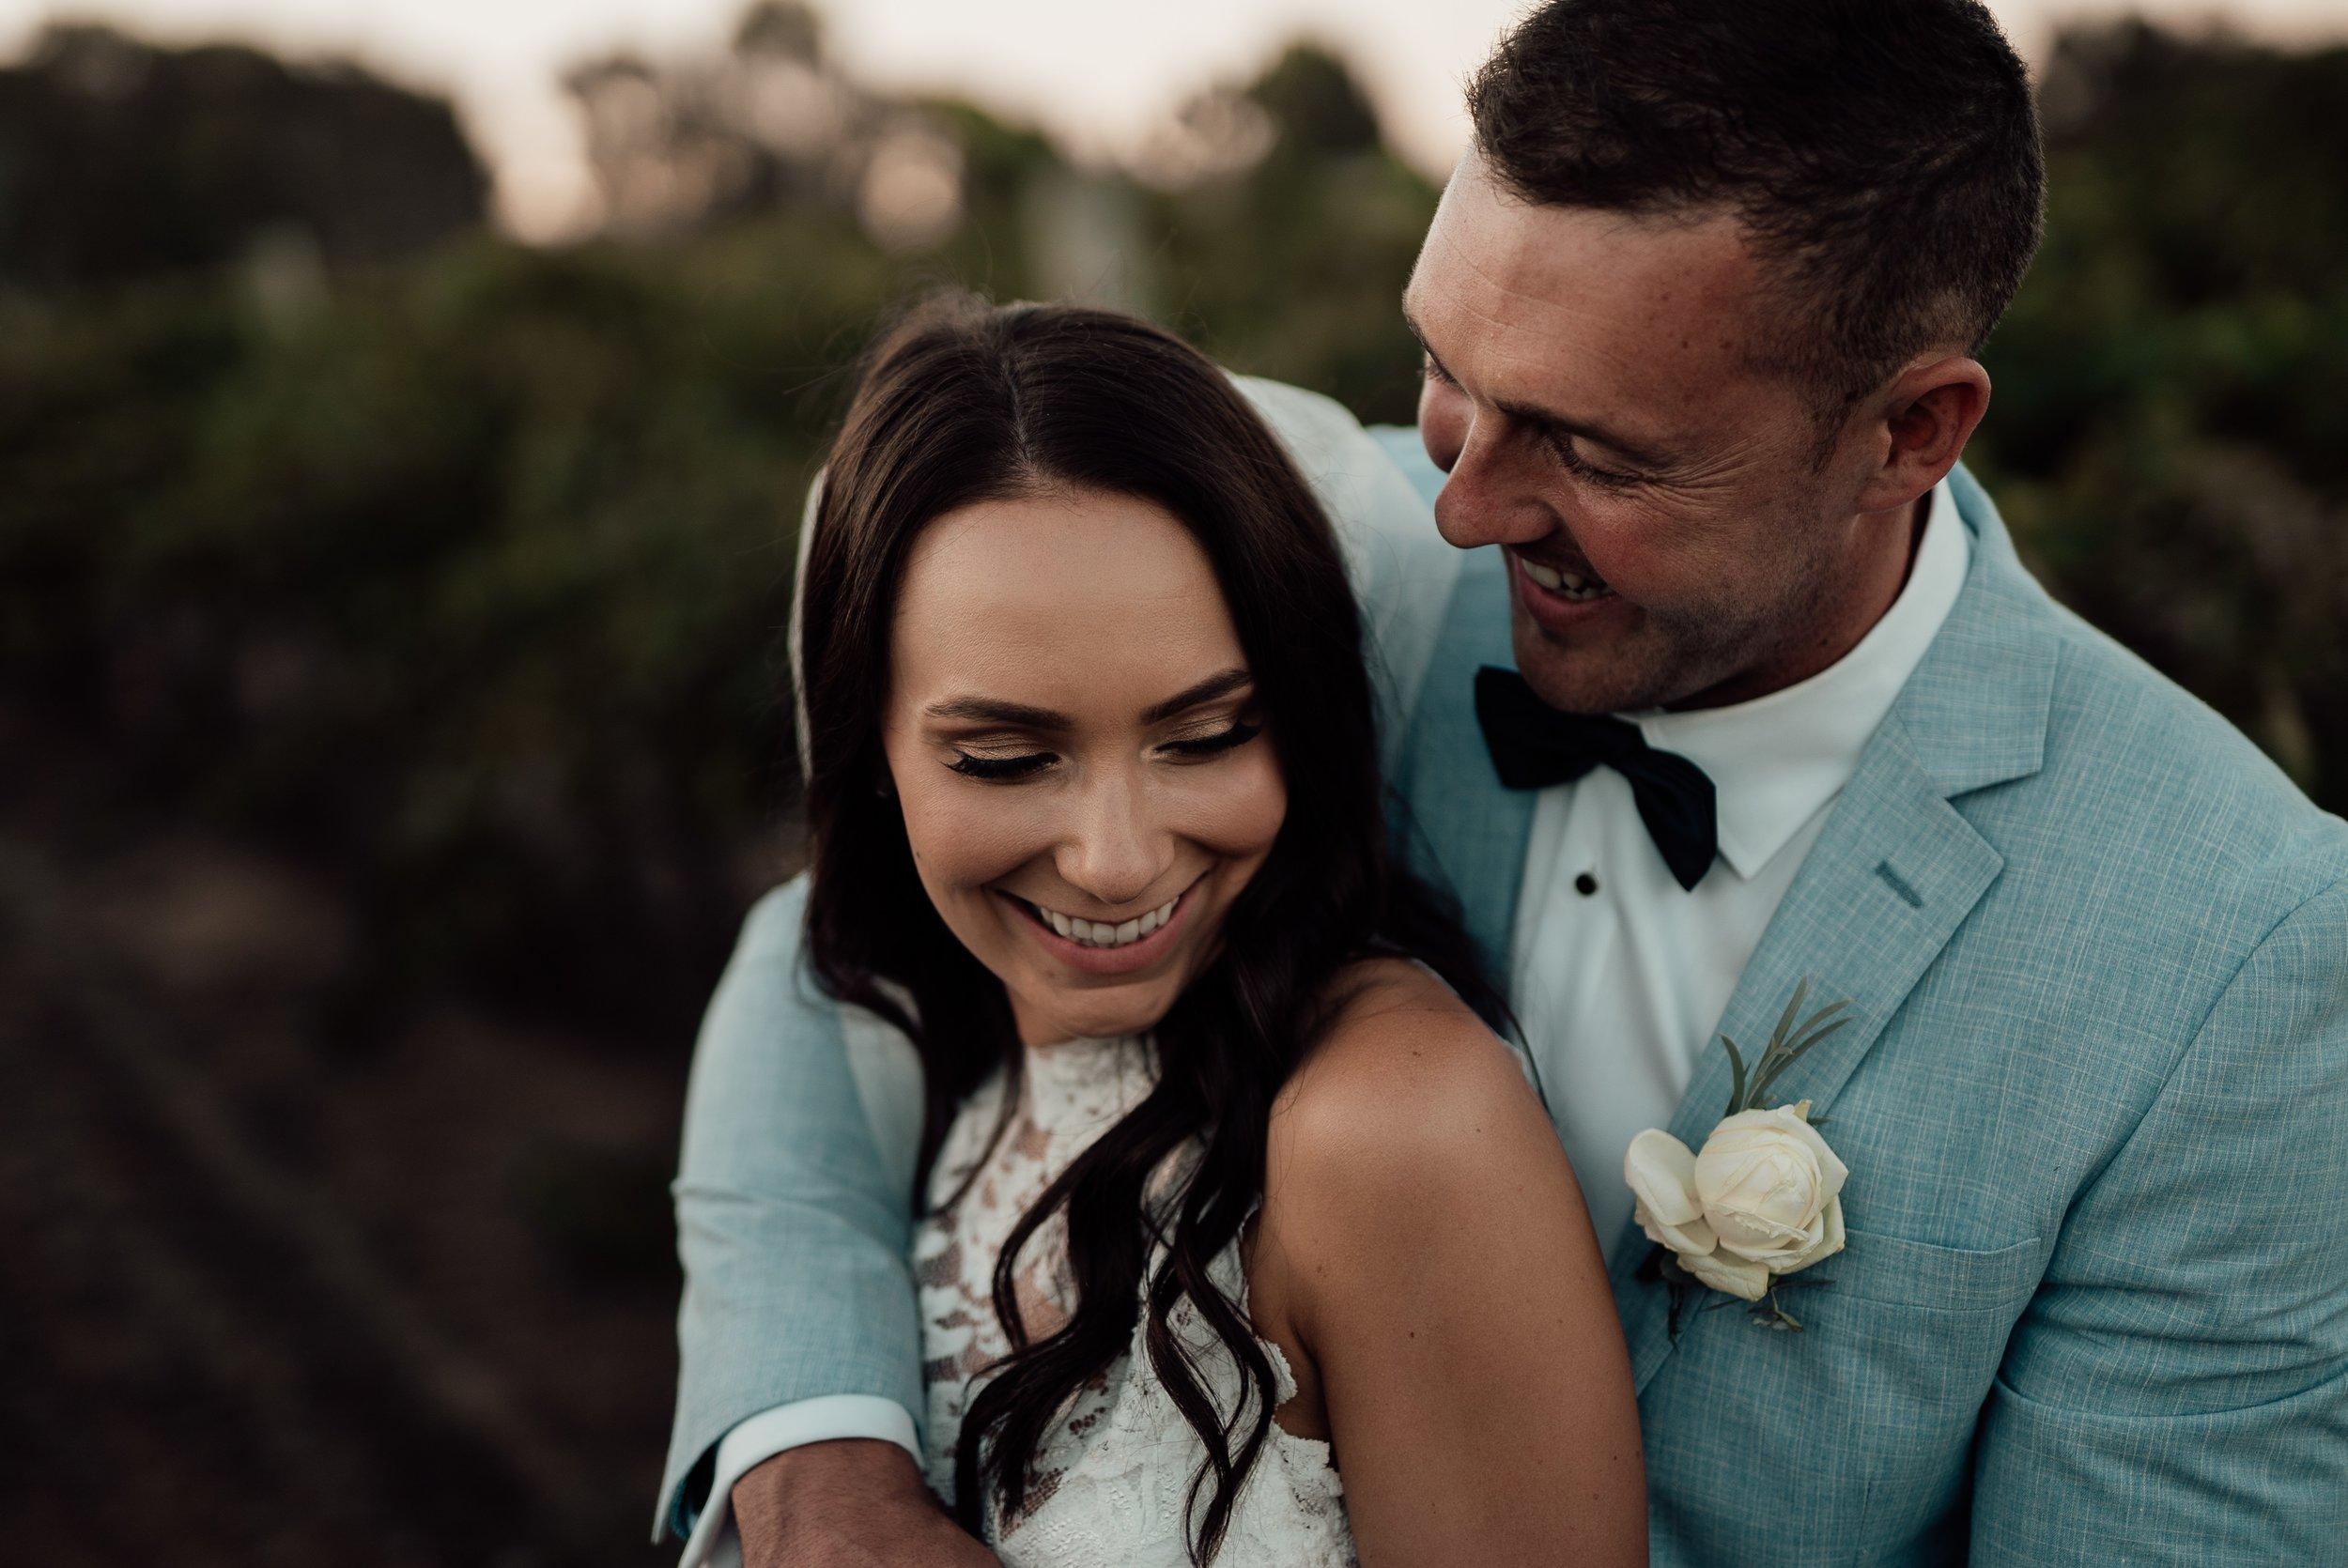 mickalathomas_puremacphotography_weddingphotographer_couplephotographer_Sheppartonphotographer_1474.jpg